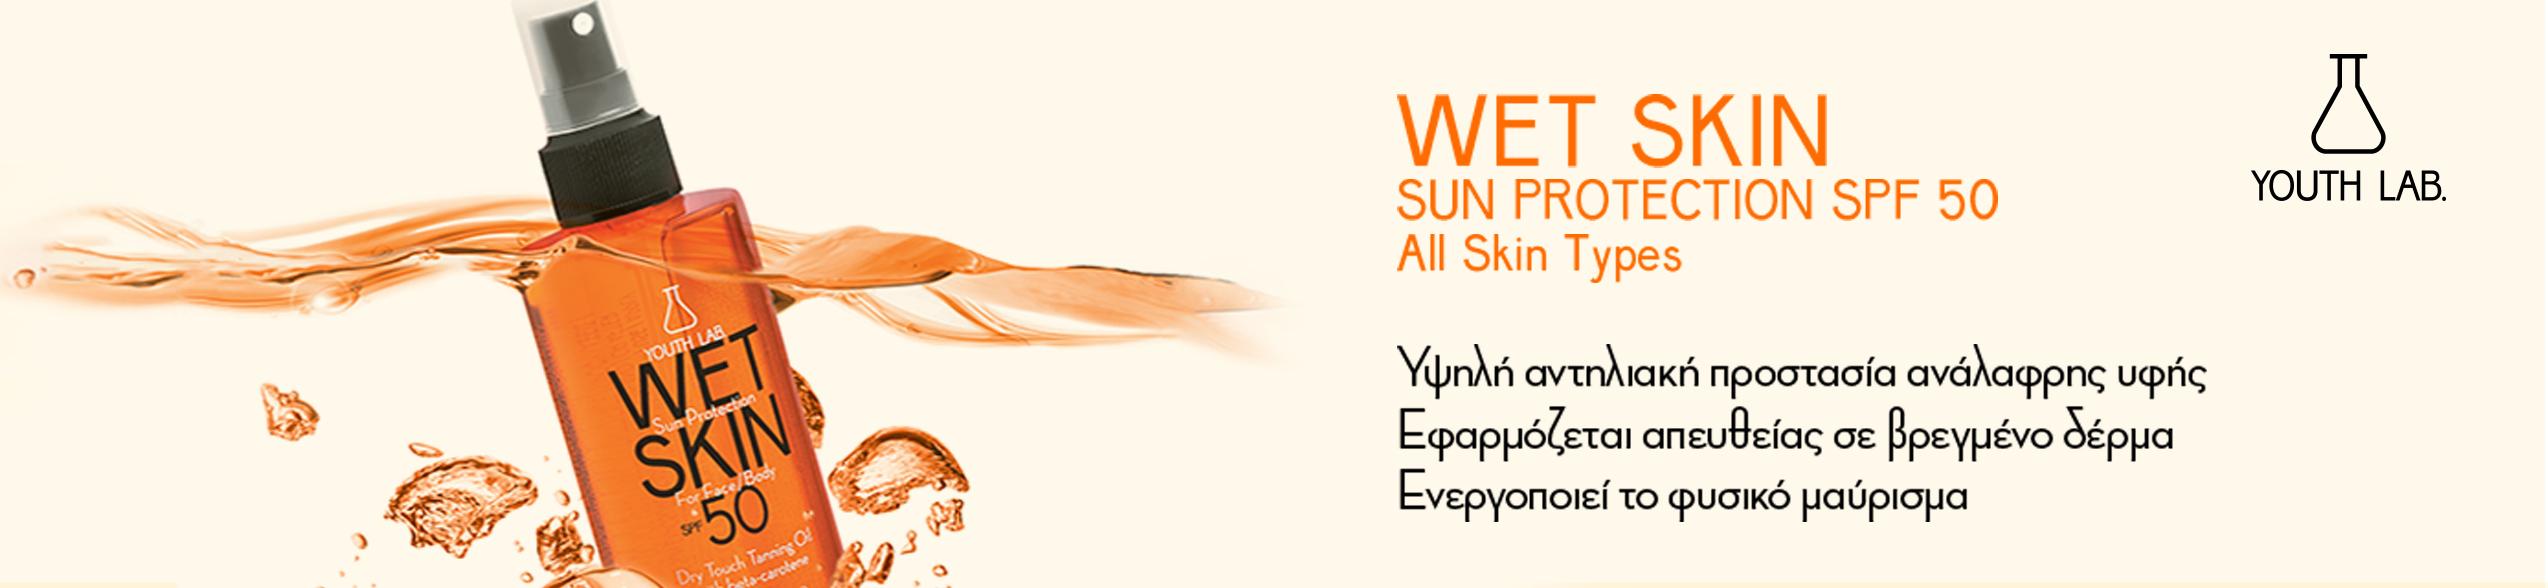 wet skin youth lab